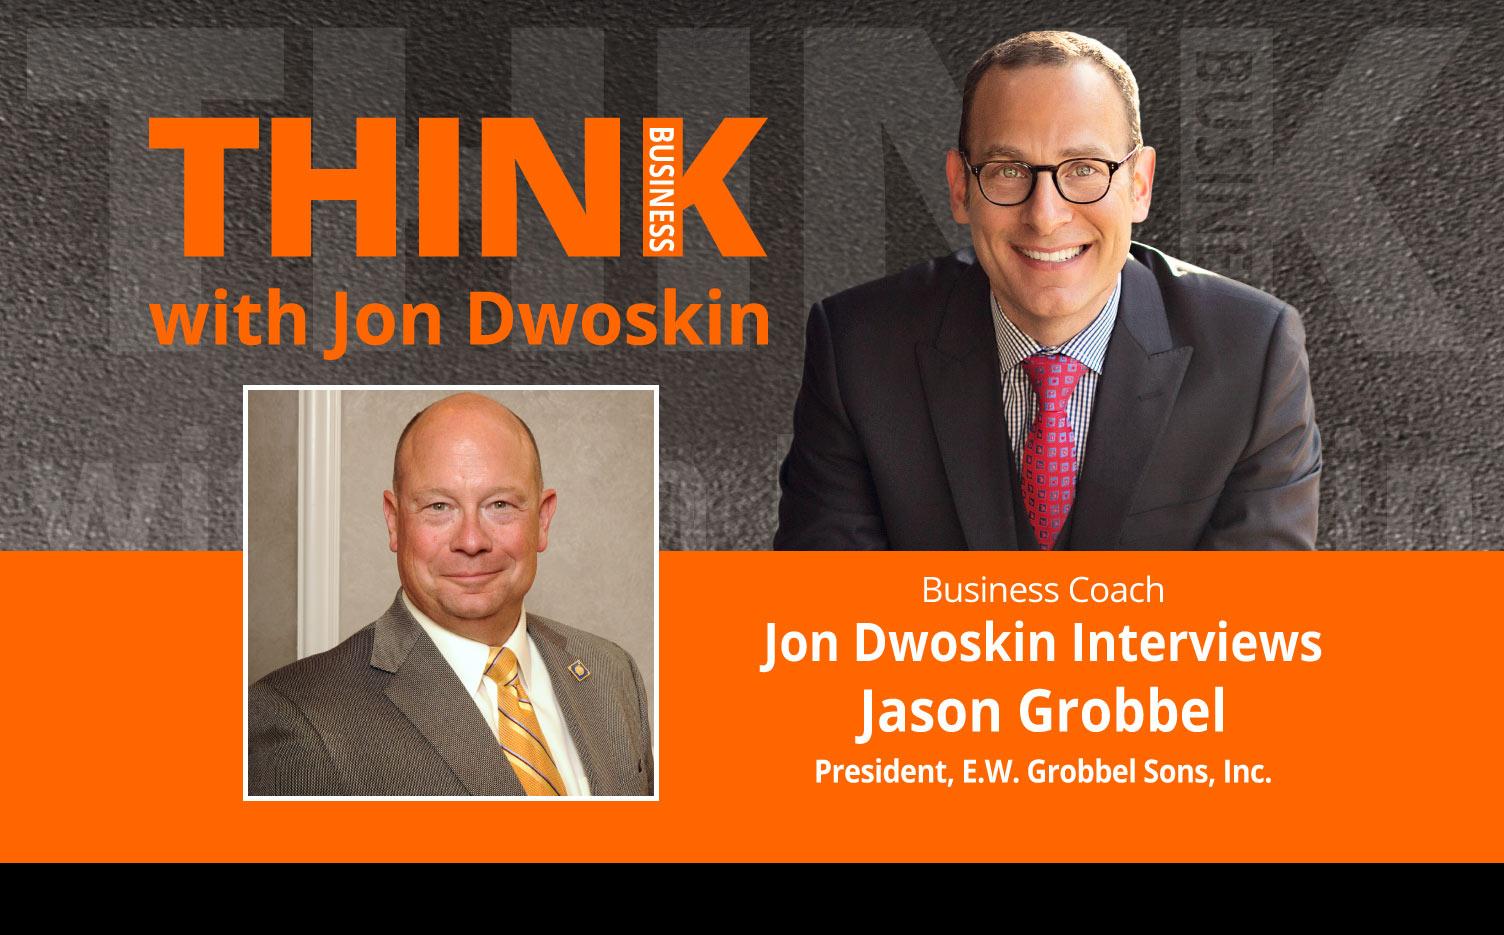 THINK Business Podcast: Jon Dwoskin Interviews Jason Grobbel, President, E.W. Grobbel Sons, Inc.